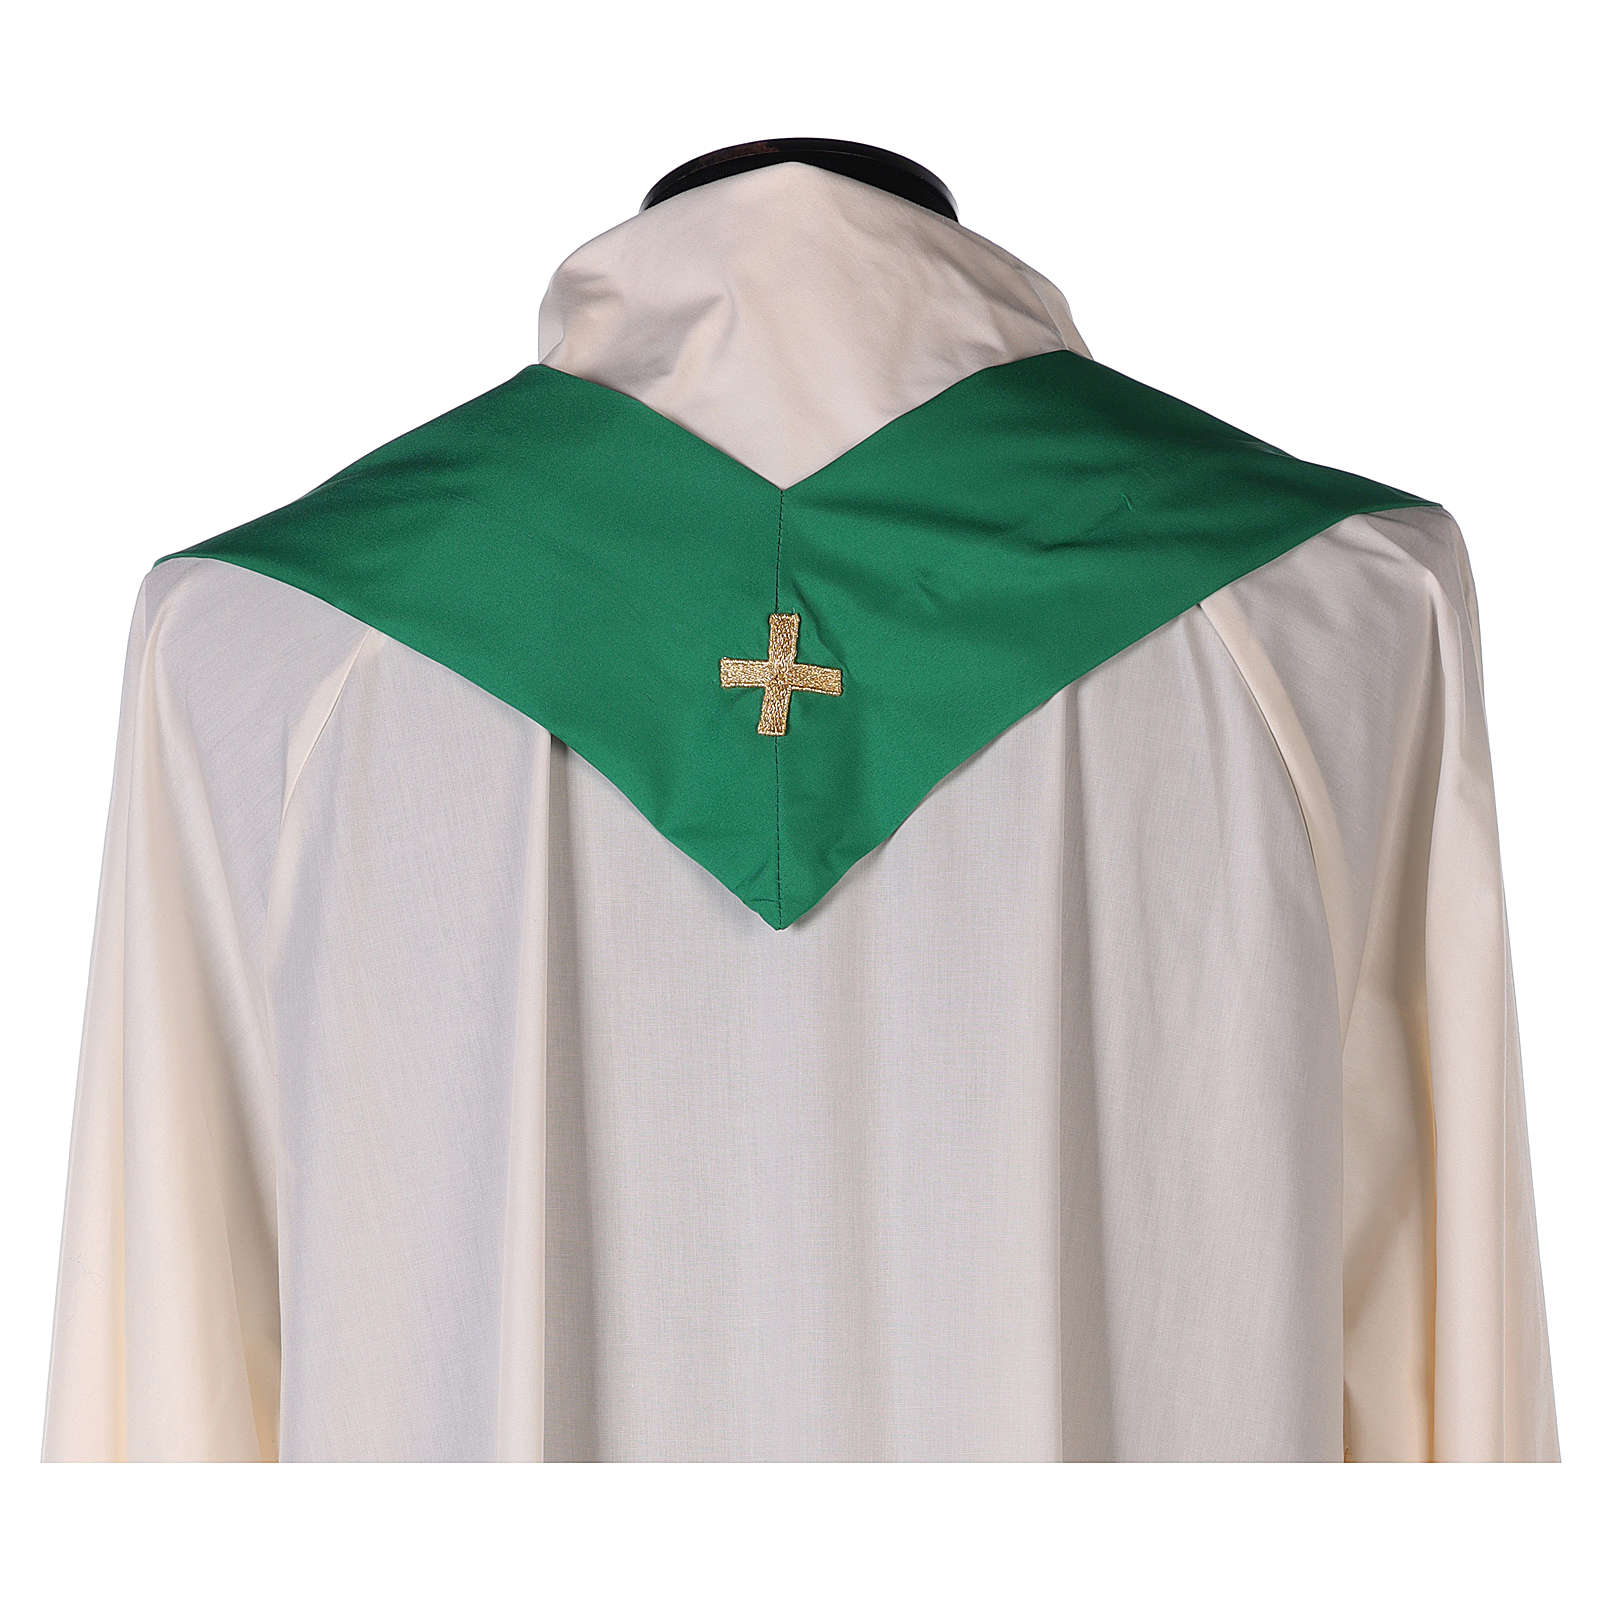 Casulla poliéster bordado cruz decorada 4